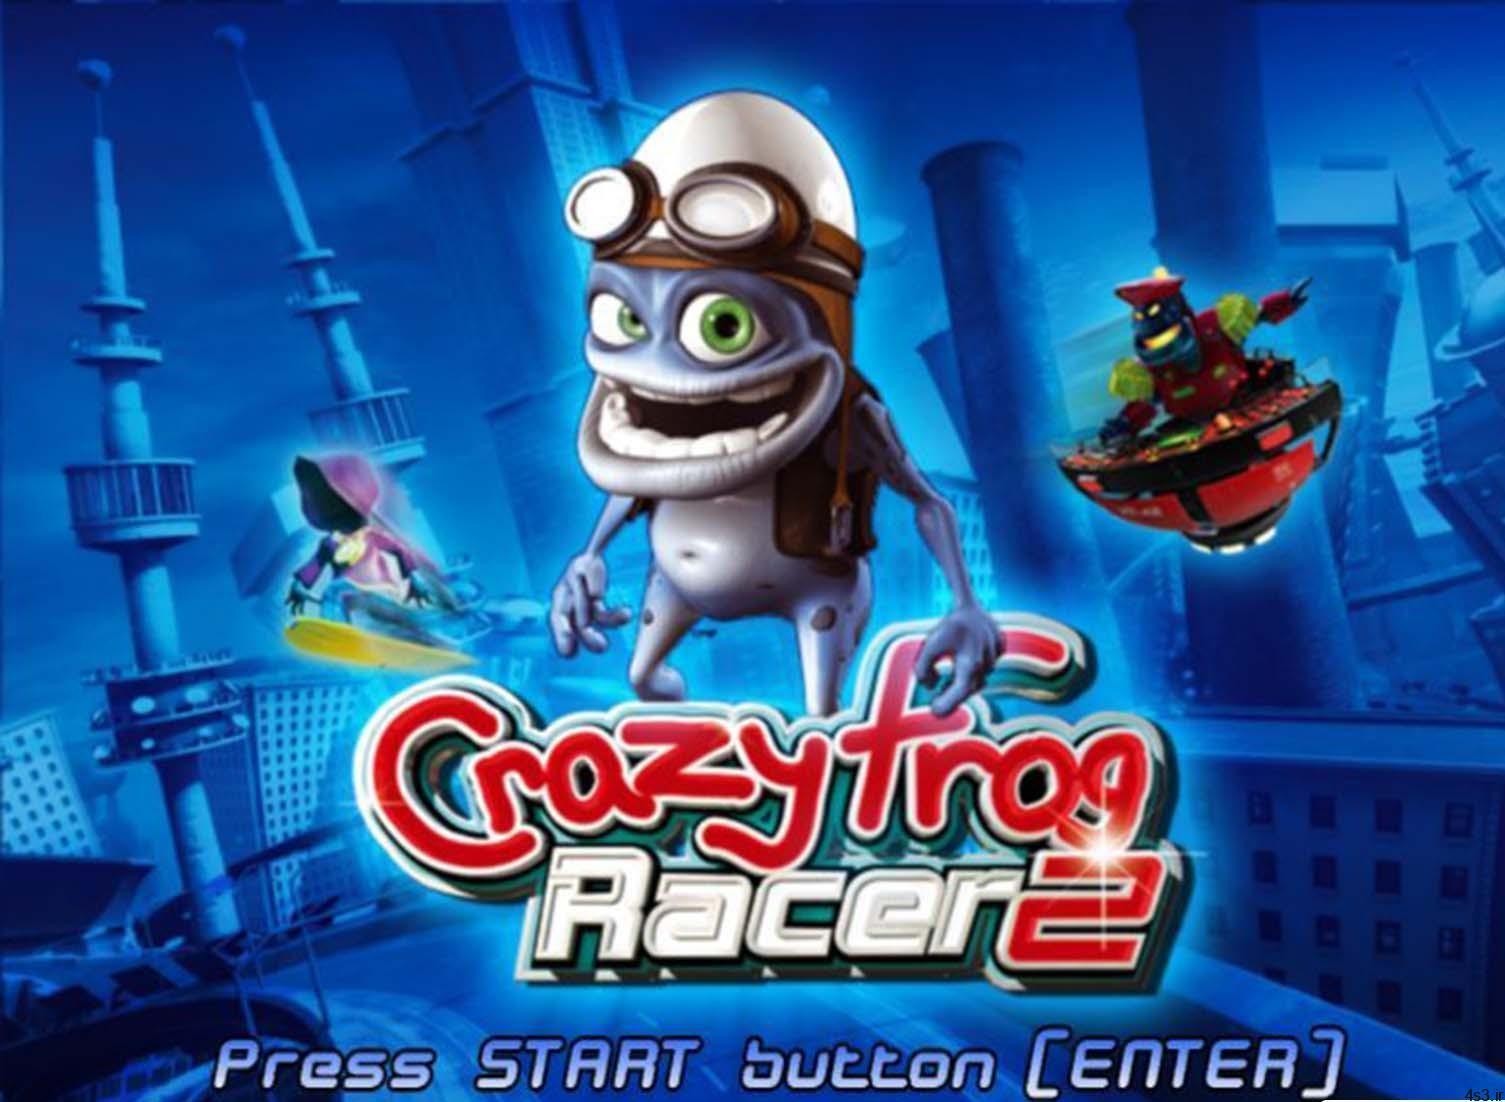 Crazy Frog Racer v2 بازی مسابقات قورباغه دیوانه e1596282118121 - دانلود Crazy Frog Racer v2 - بازی مسابقات قورباغه دیوانه